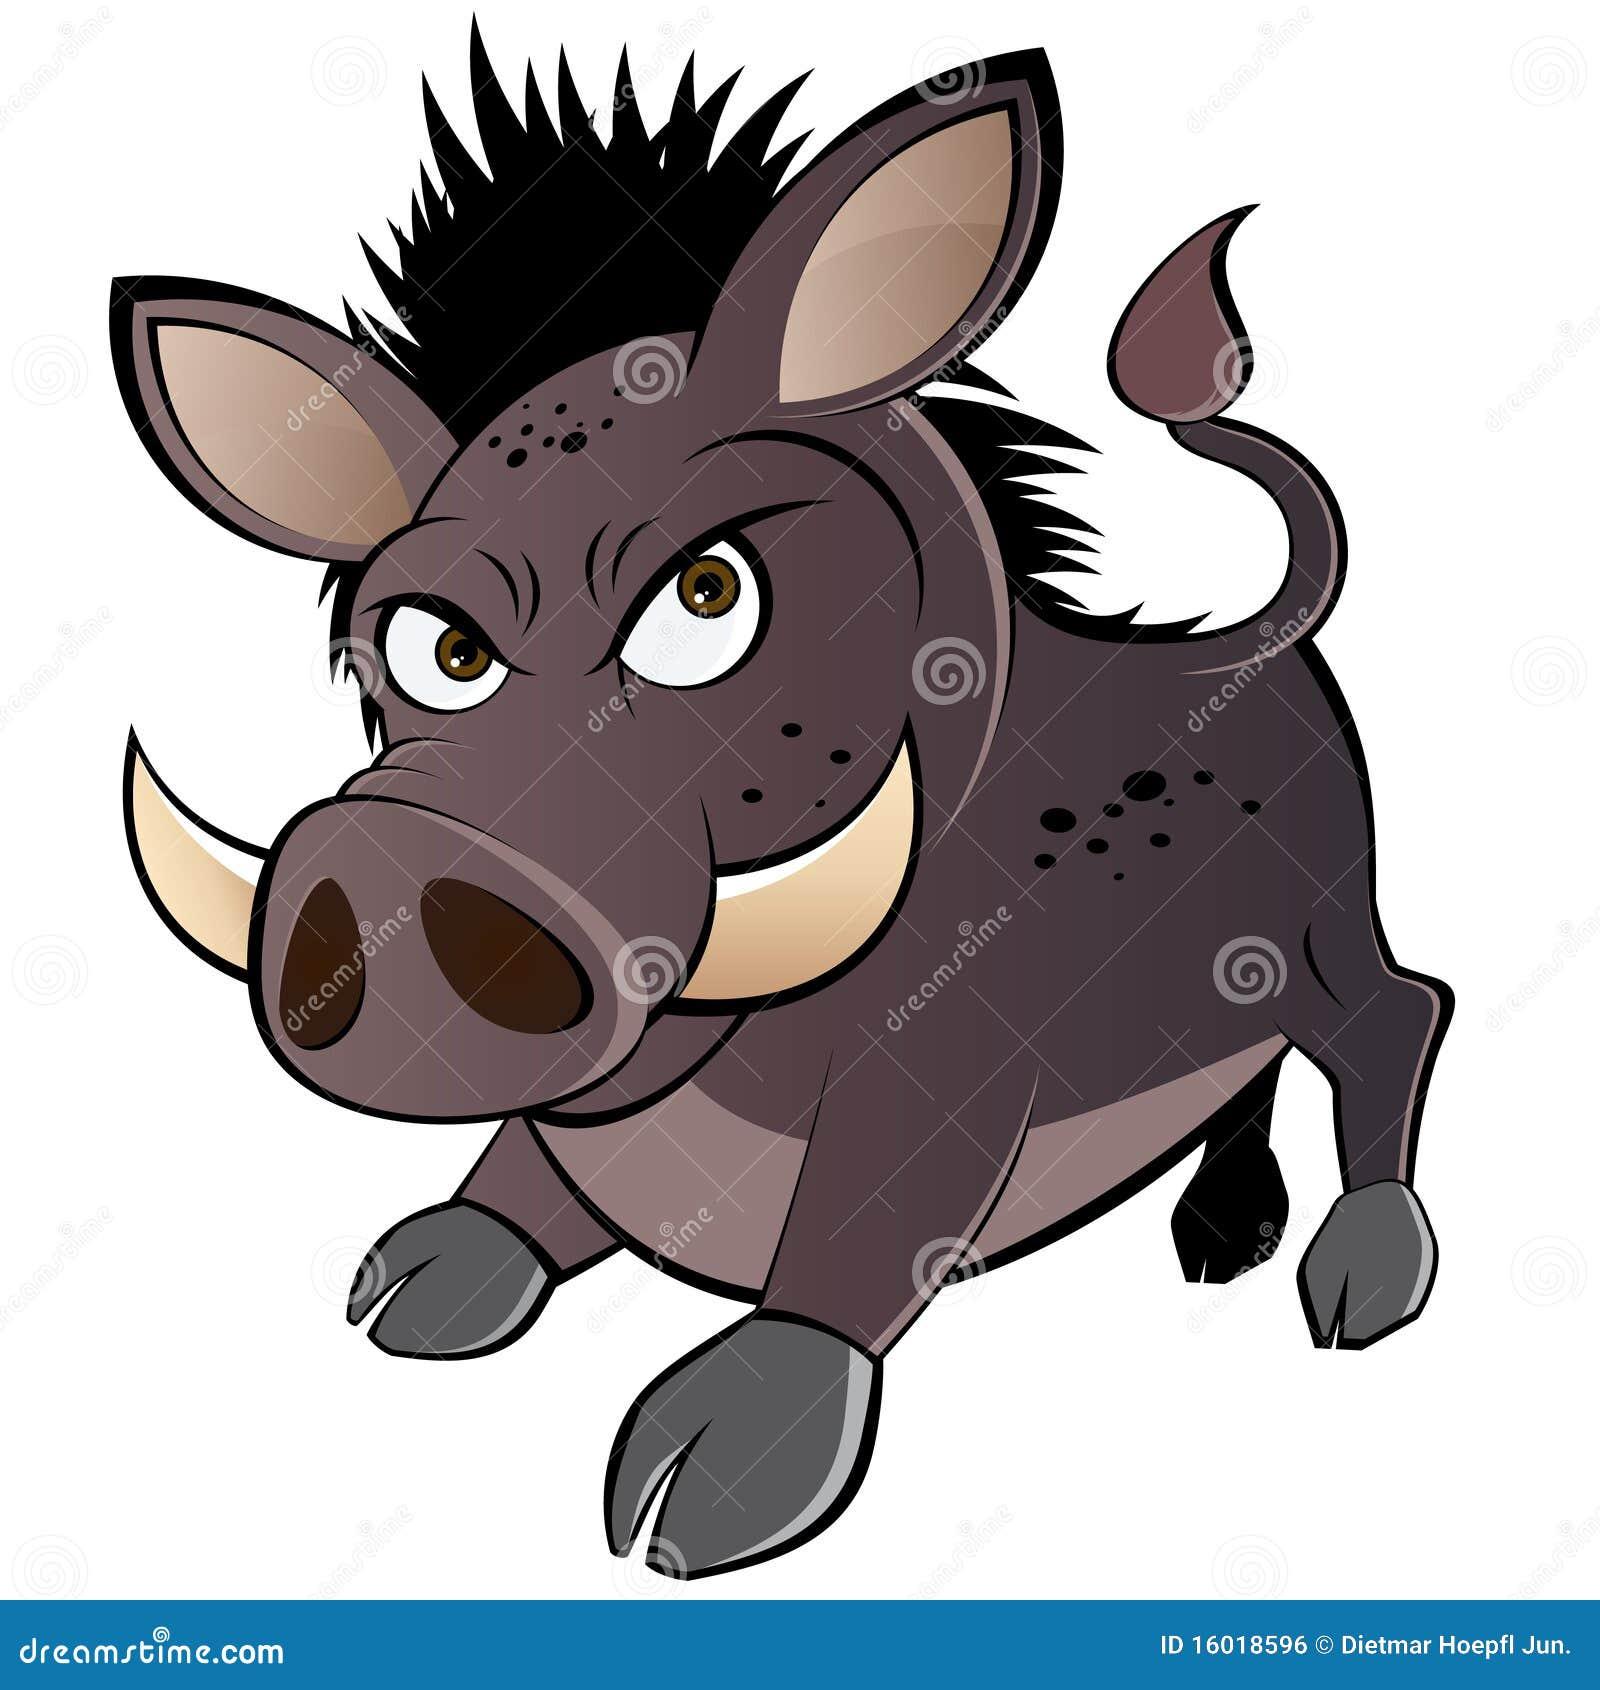 Angry cartoon warthog royalty free stock image